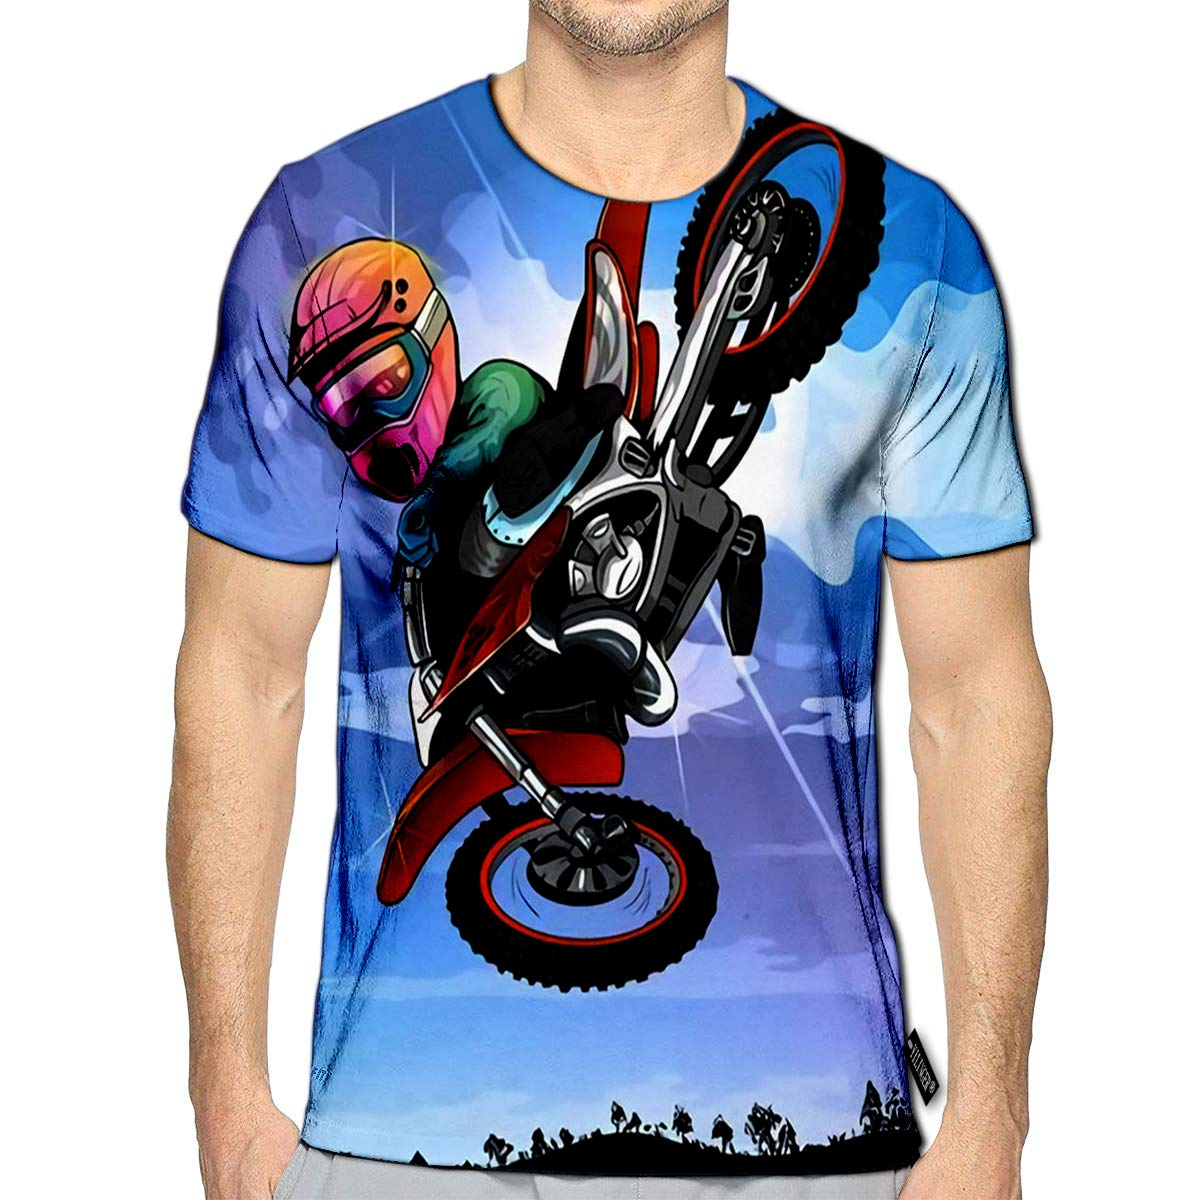 YILINGER 3D Printed T-Shirts Zambia Travel Tribal Tourist Souvenir Short Sleeve Tops Tees